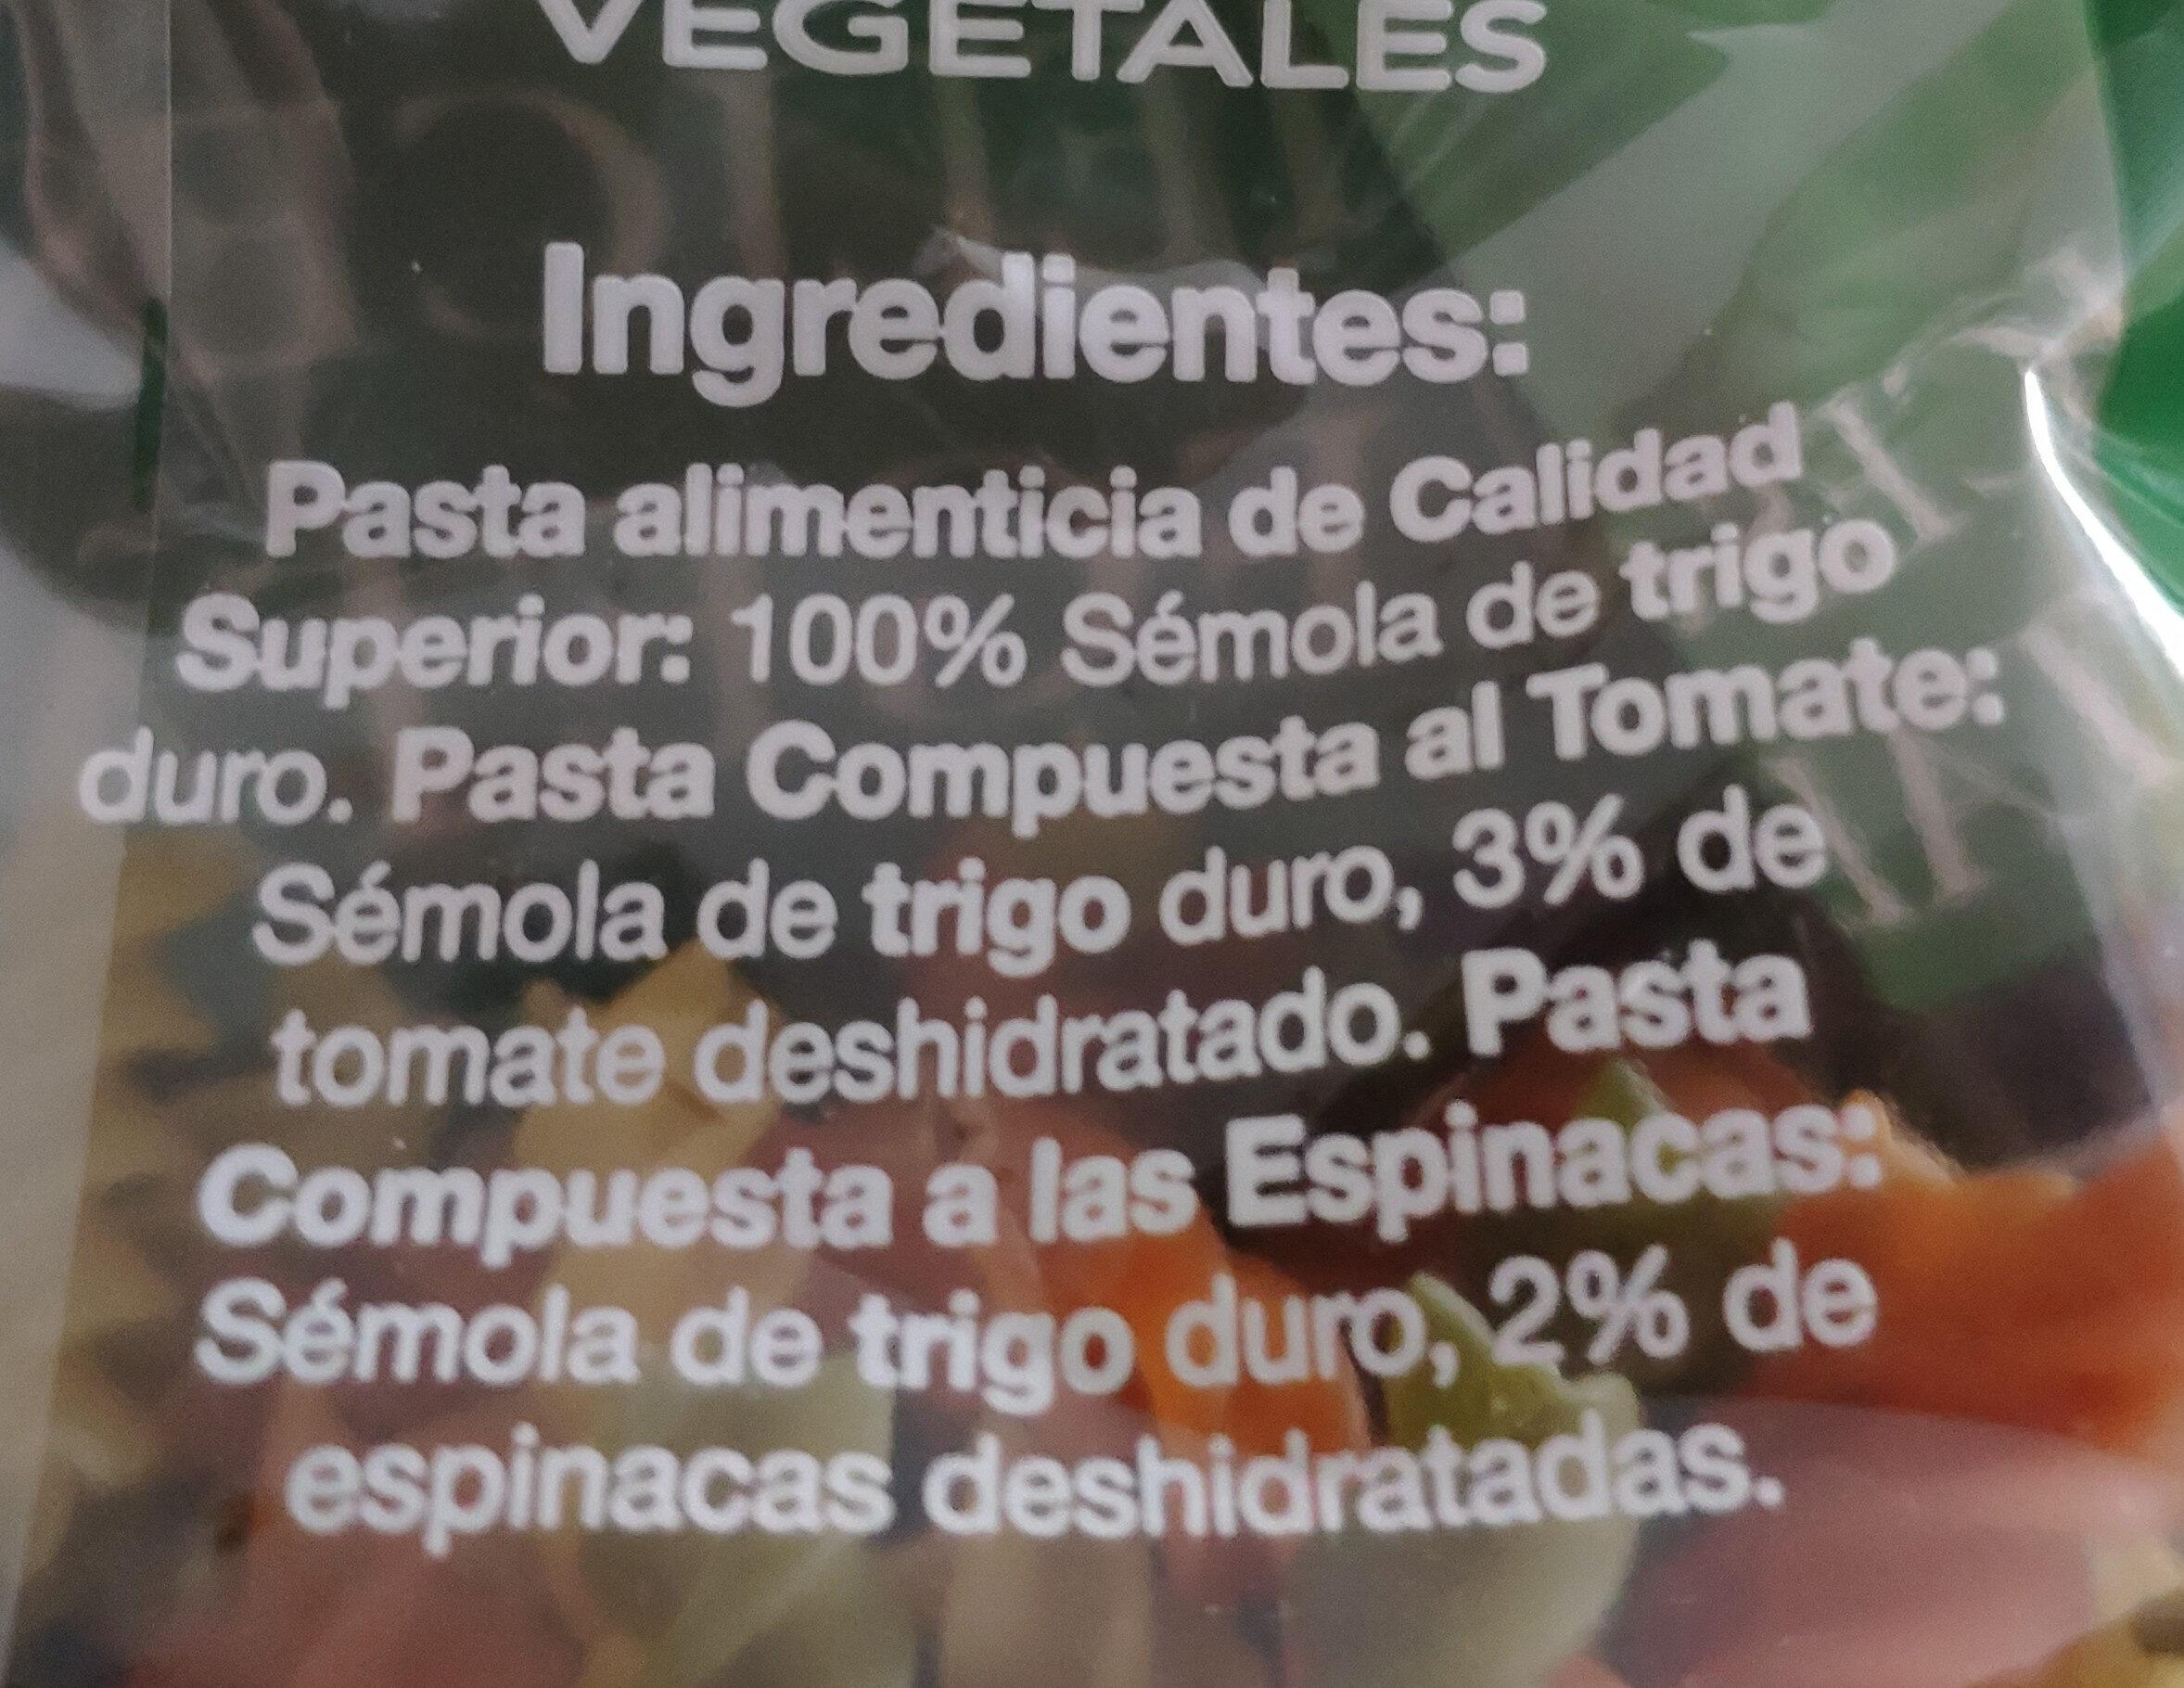 Hélices con vegetales - Ingrédients - es